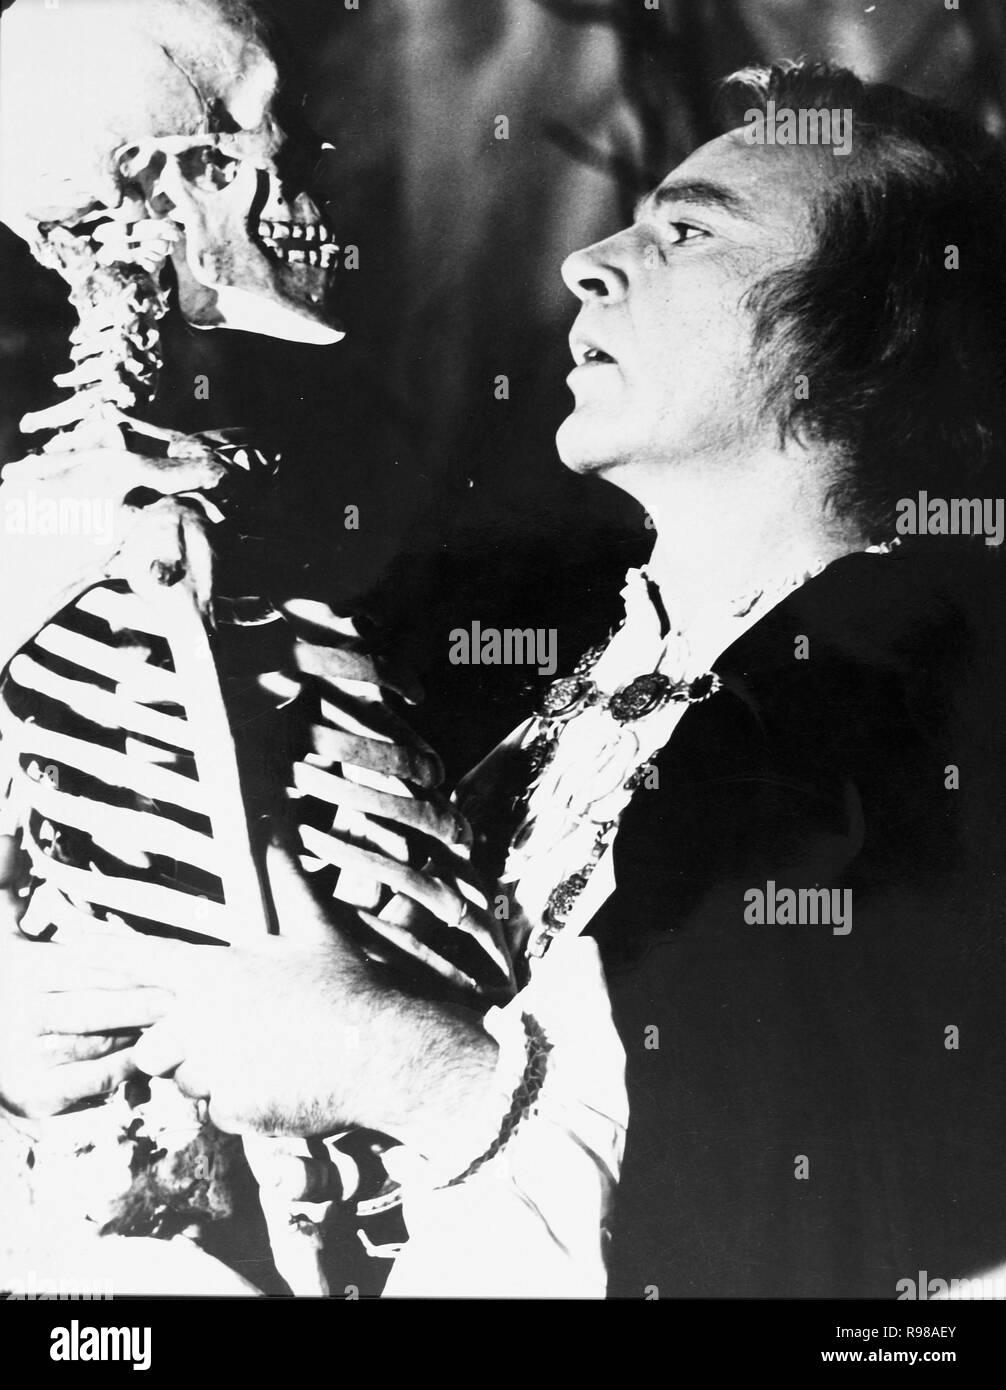 Original film title: DOCTOR FAUSTUS. English title: DOCTOR FAUSTUS. Year: 1967. Director: RICHARD BURTON. Stars: RICHARD BURTON. Credit: OXFORD UNIV/NASSAU/VENFILMS/COLUMBIA / Album Stock Photo